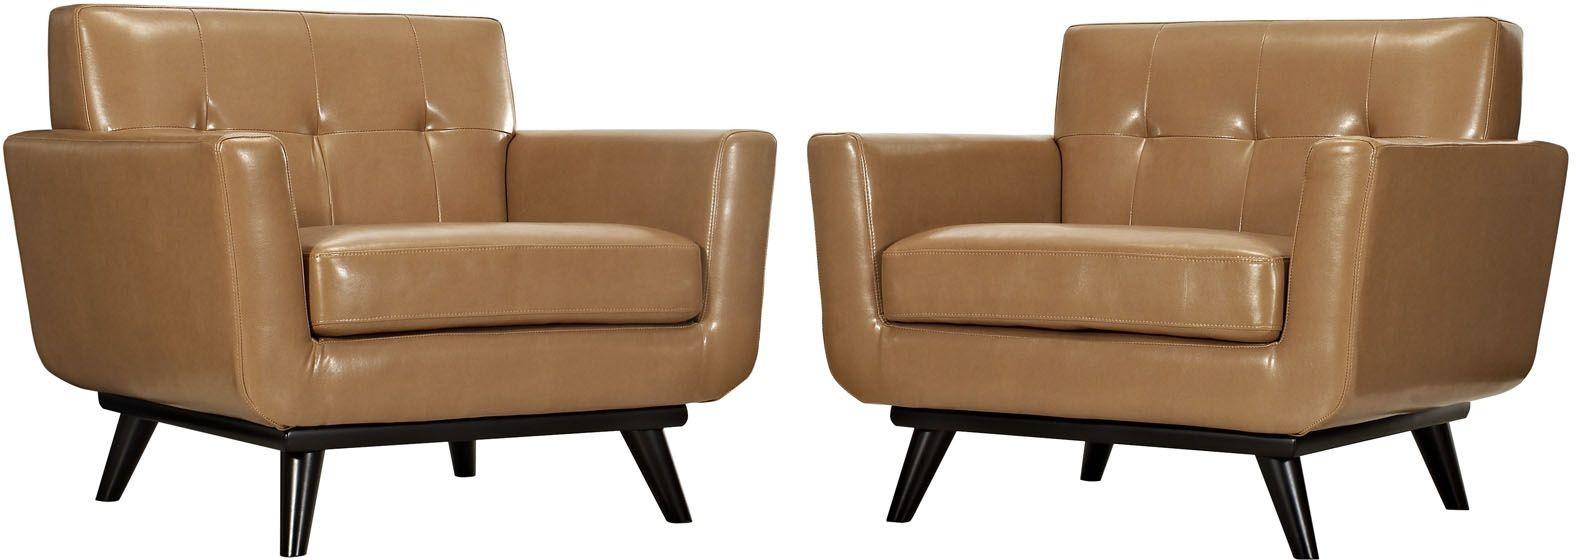 28 tan leather sofa set 00 3 pc tan amp brown leather